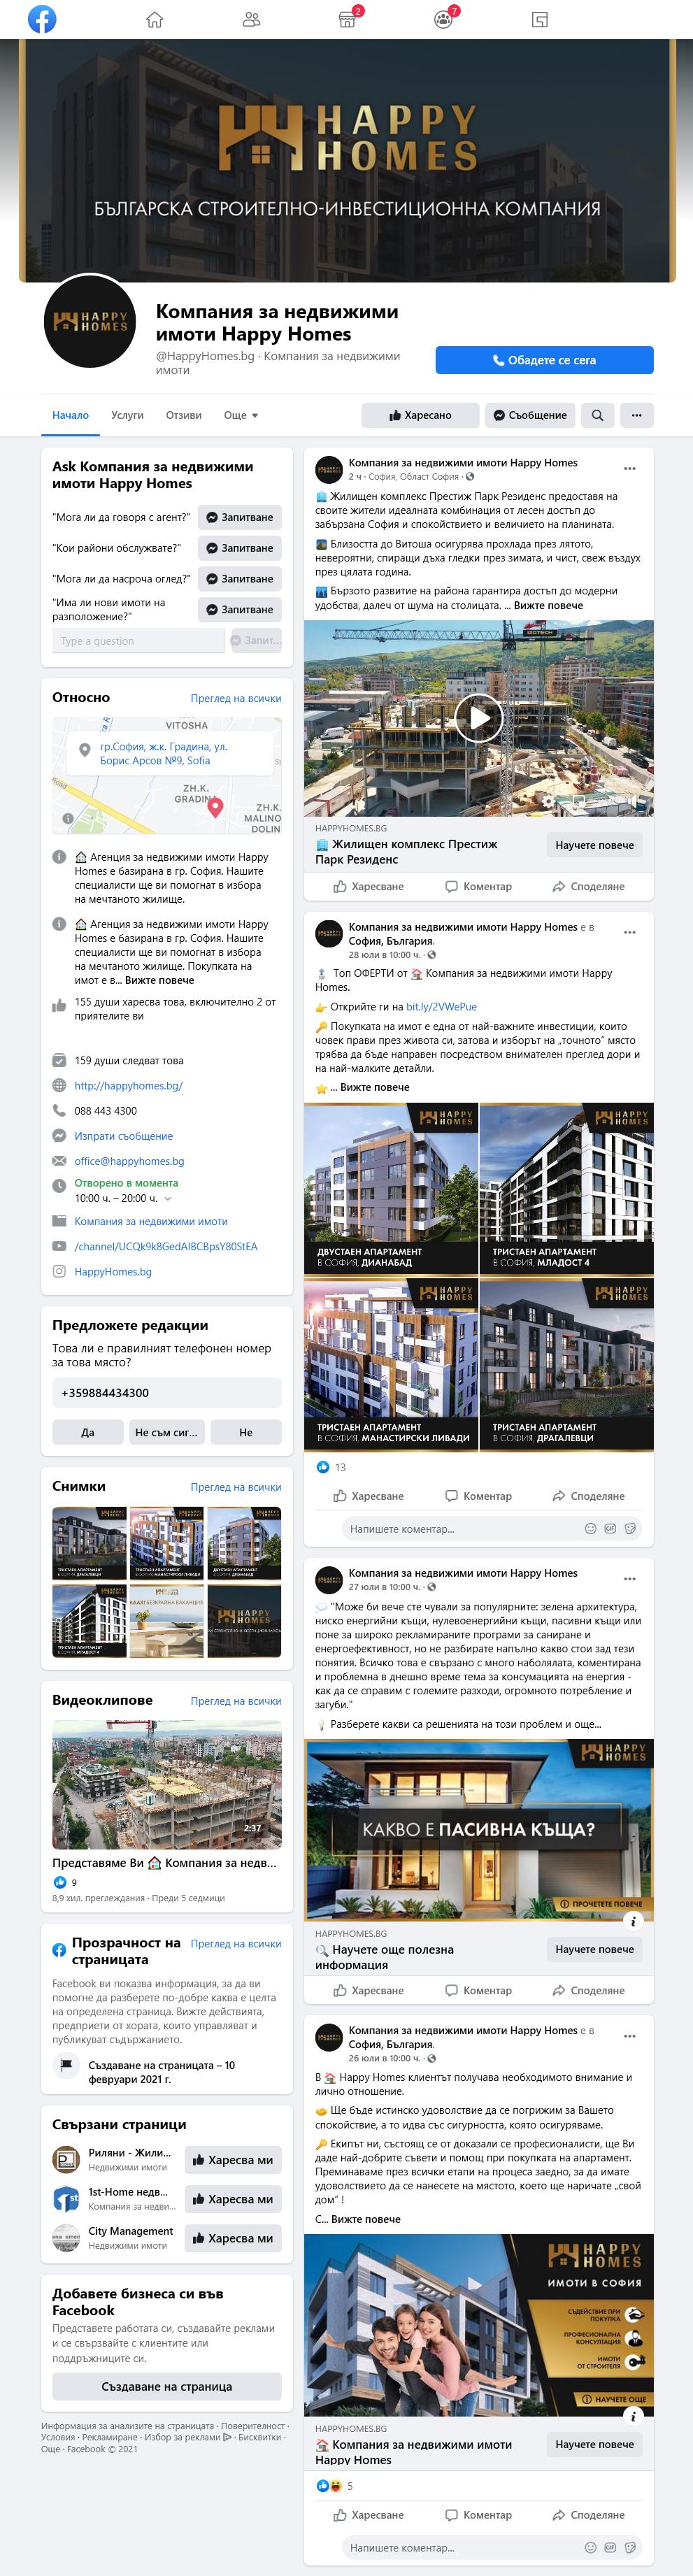 Компания Happy Homes Facebook страница